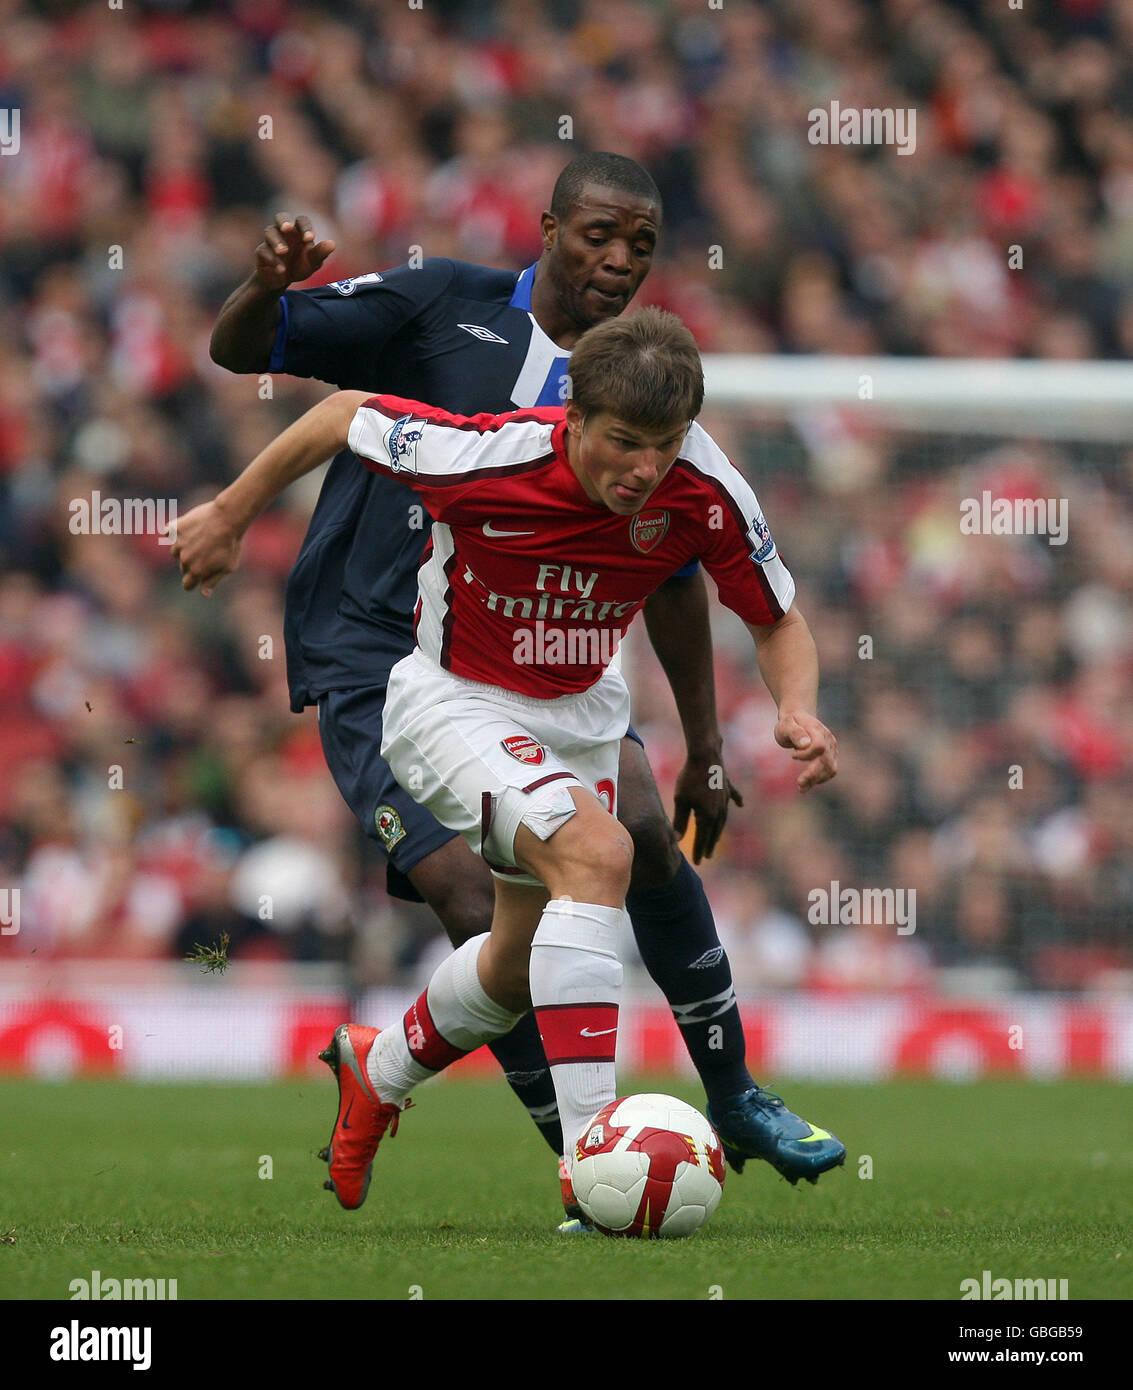 Soccer - Barclays Premier League - Arsenal v Blackburn Rovers - Emirates Stadium - Stock Image